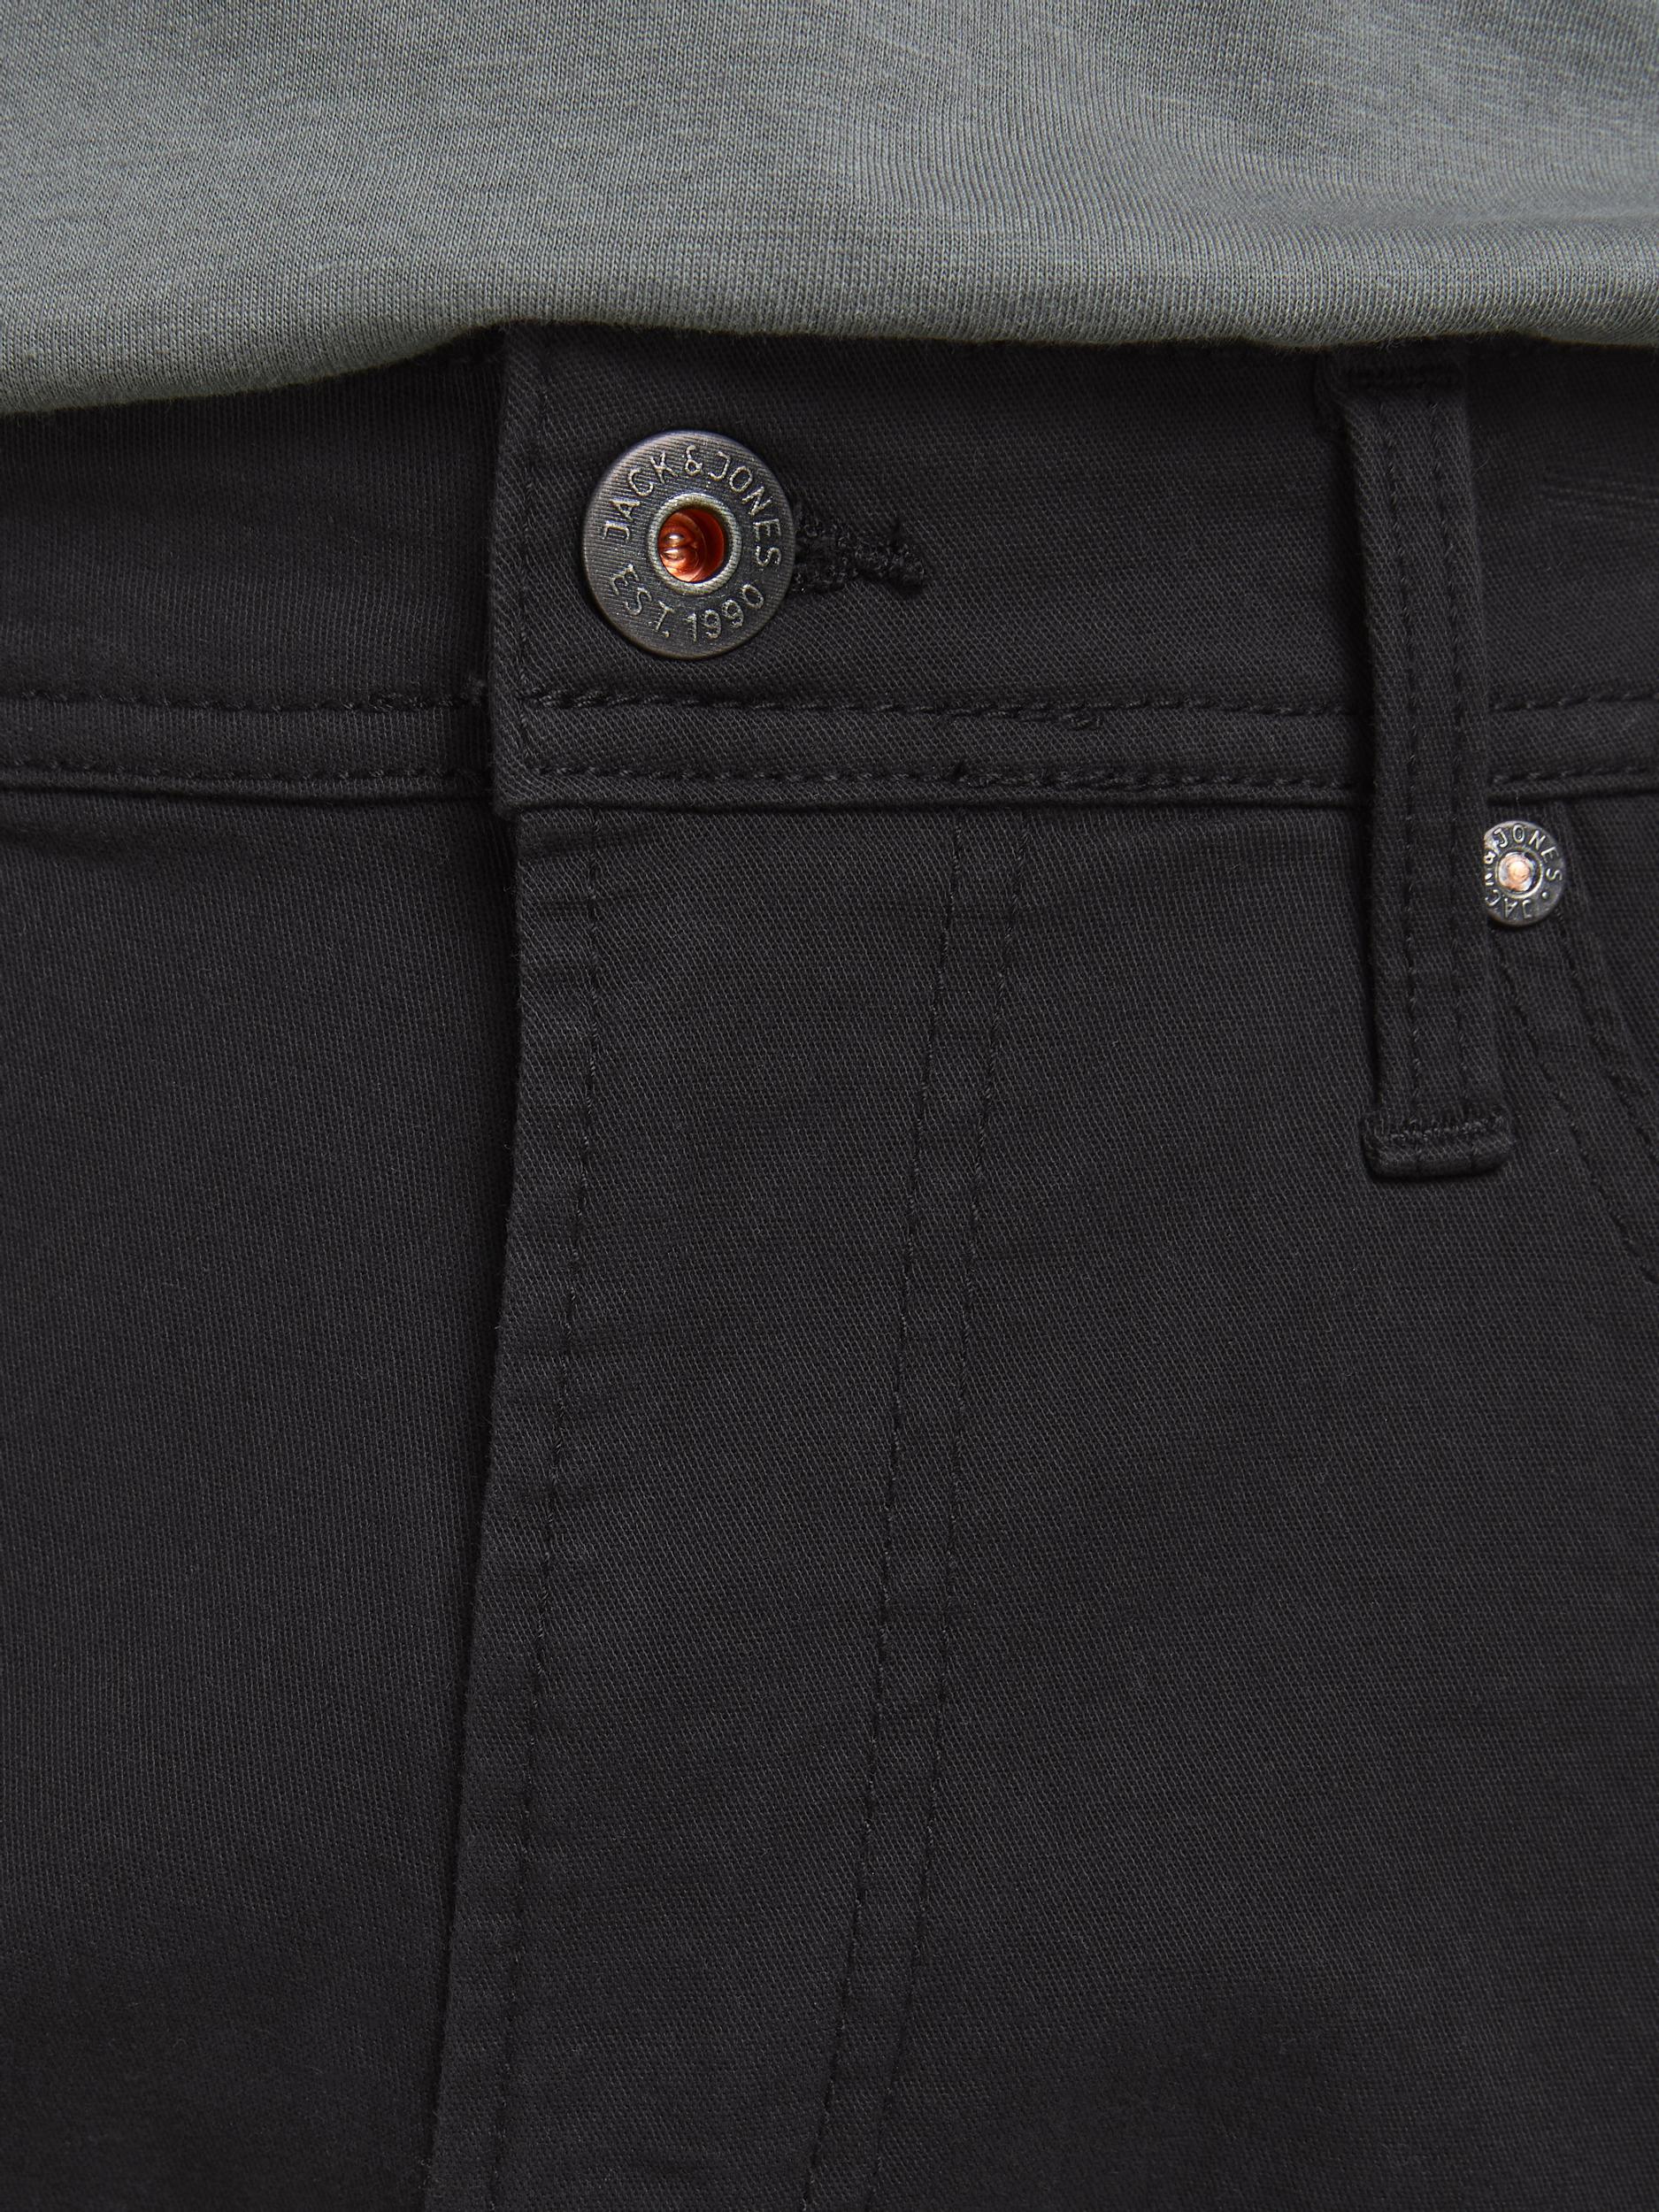 JJIRICK JJORIGINAL SHORTS 21 AKM JACK&JONES | Shorts | 12182552BLACK